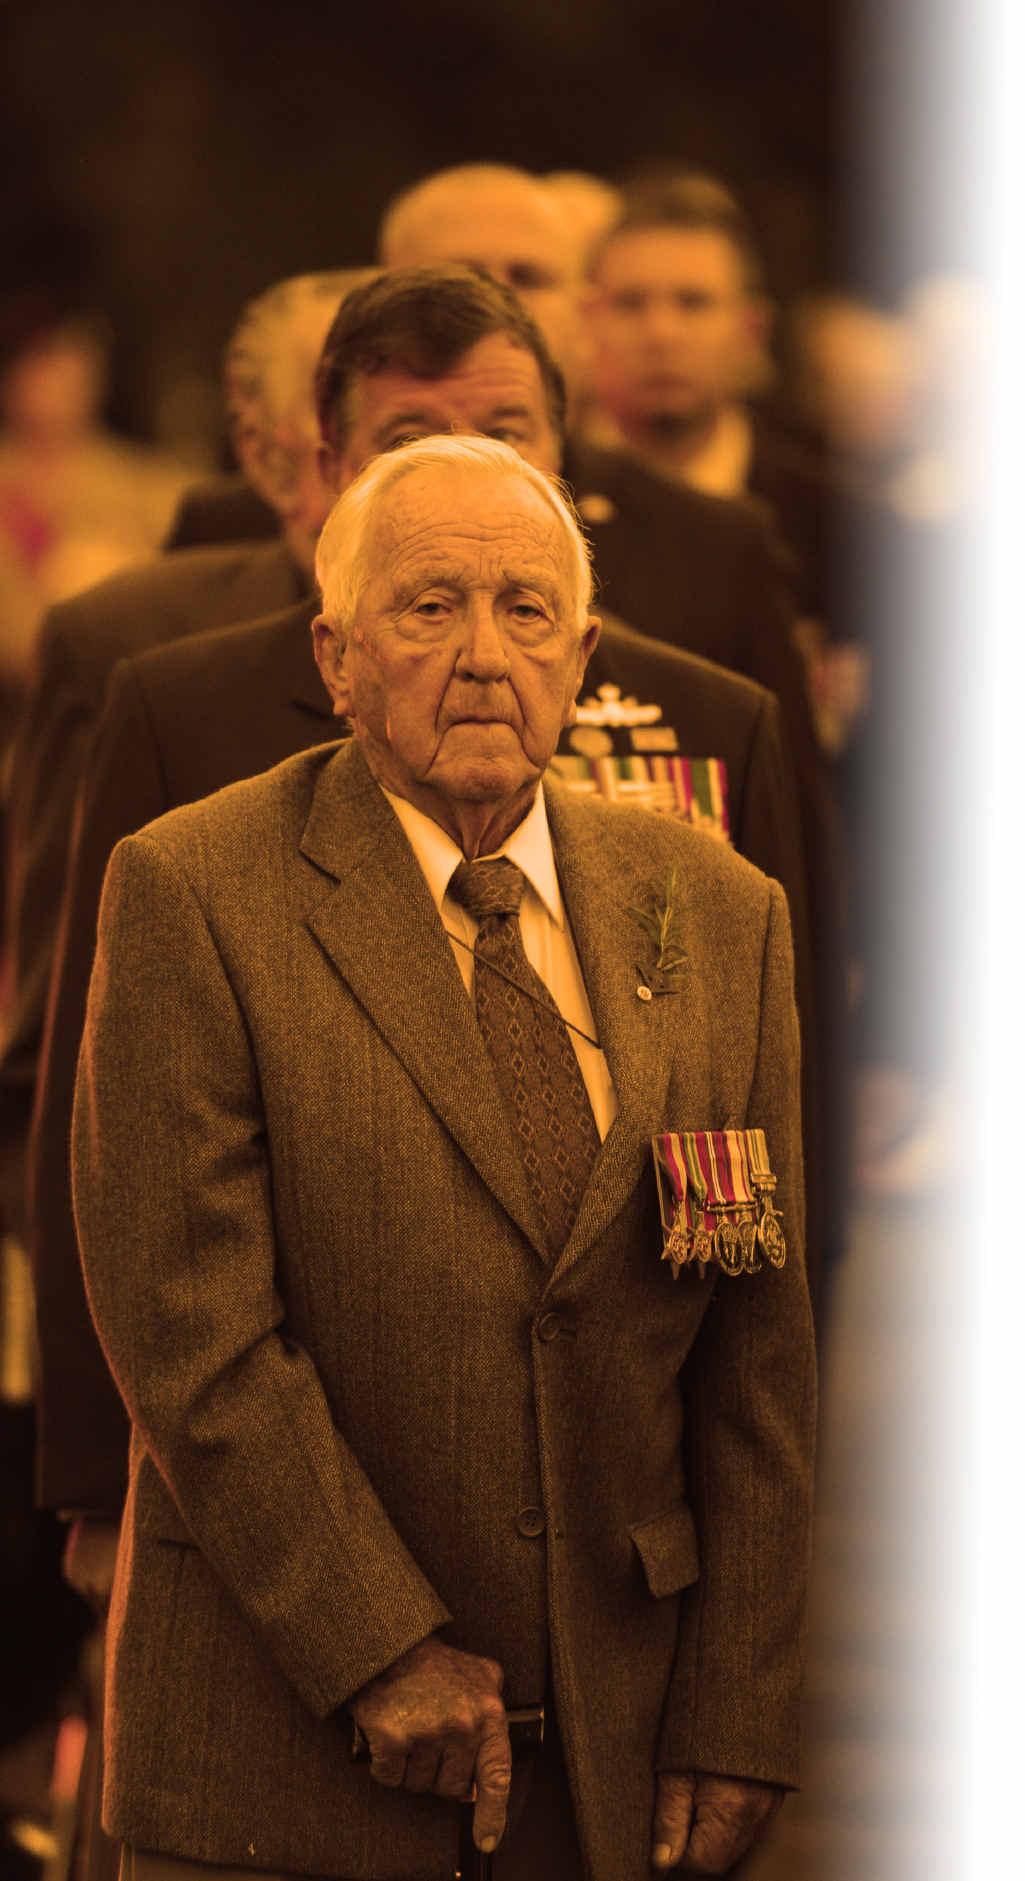 Reg Hackett at the Anzac Day dawn service in 2014.